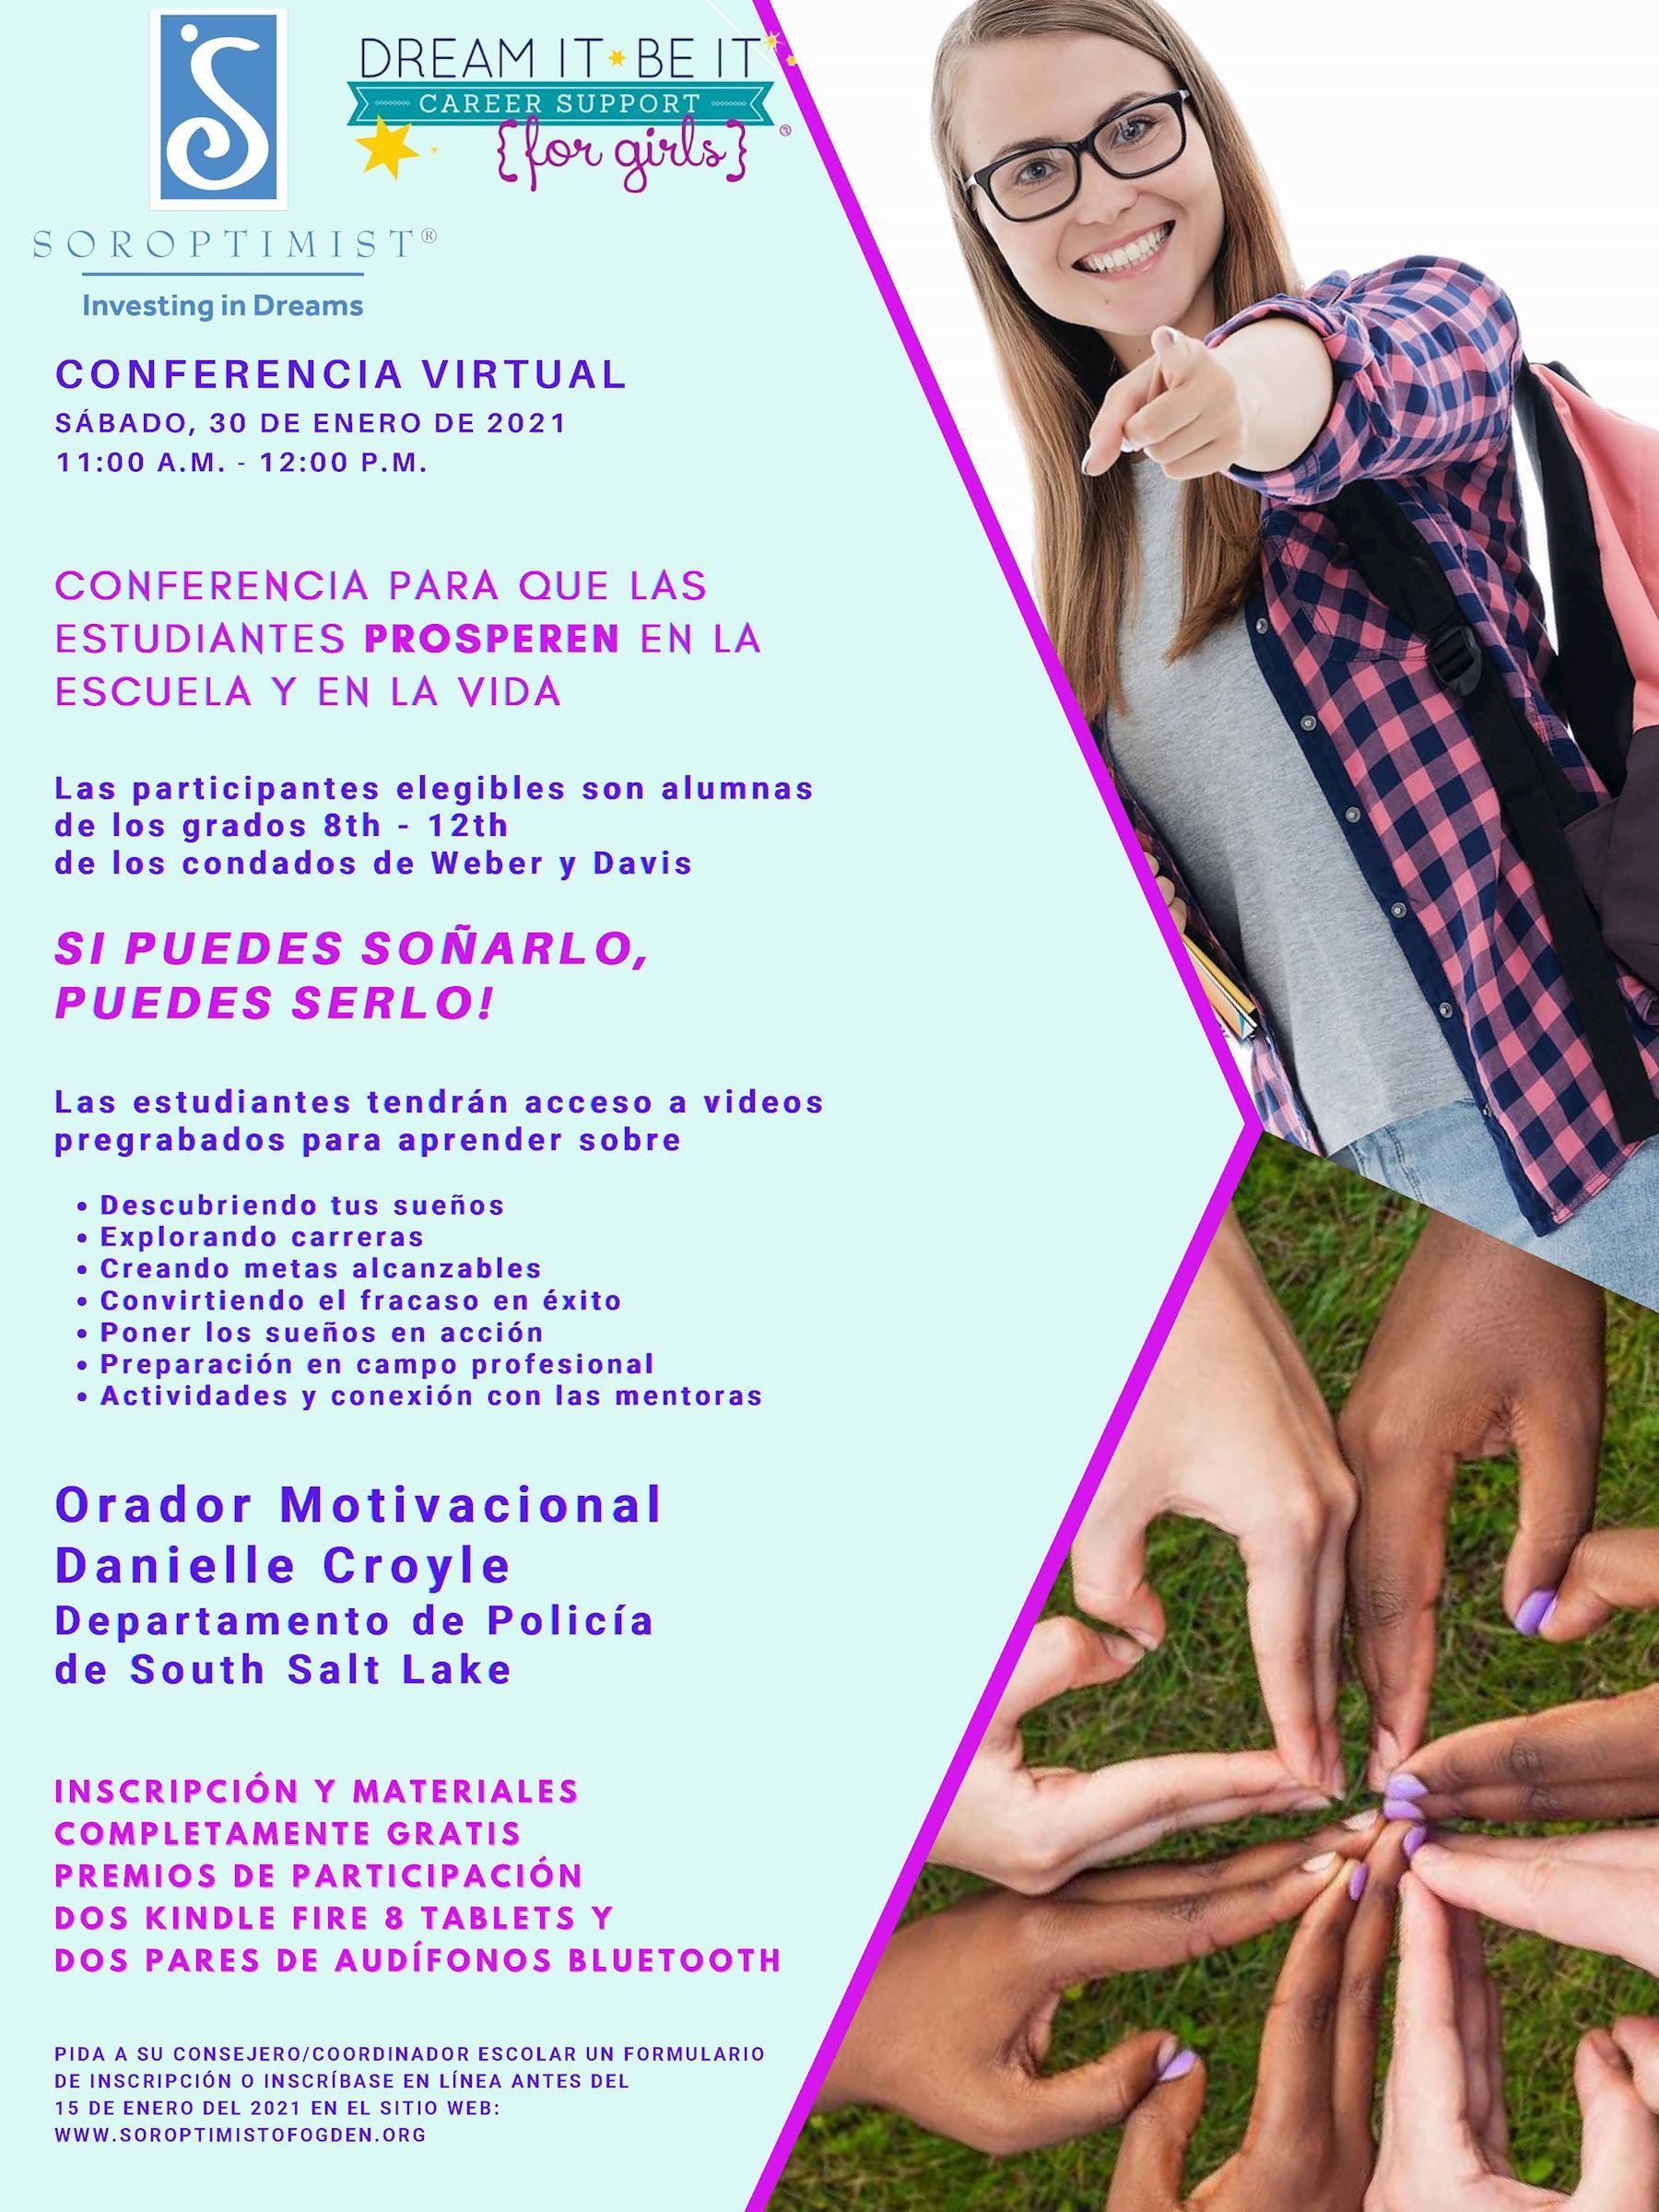 Spanish Event Poster